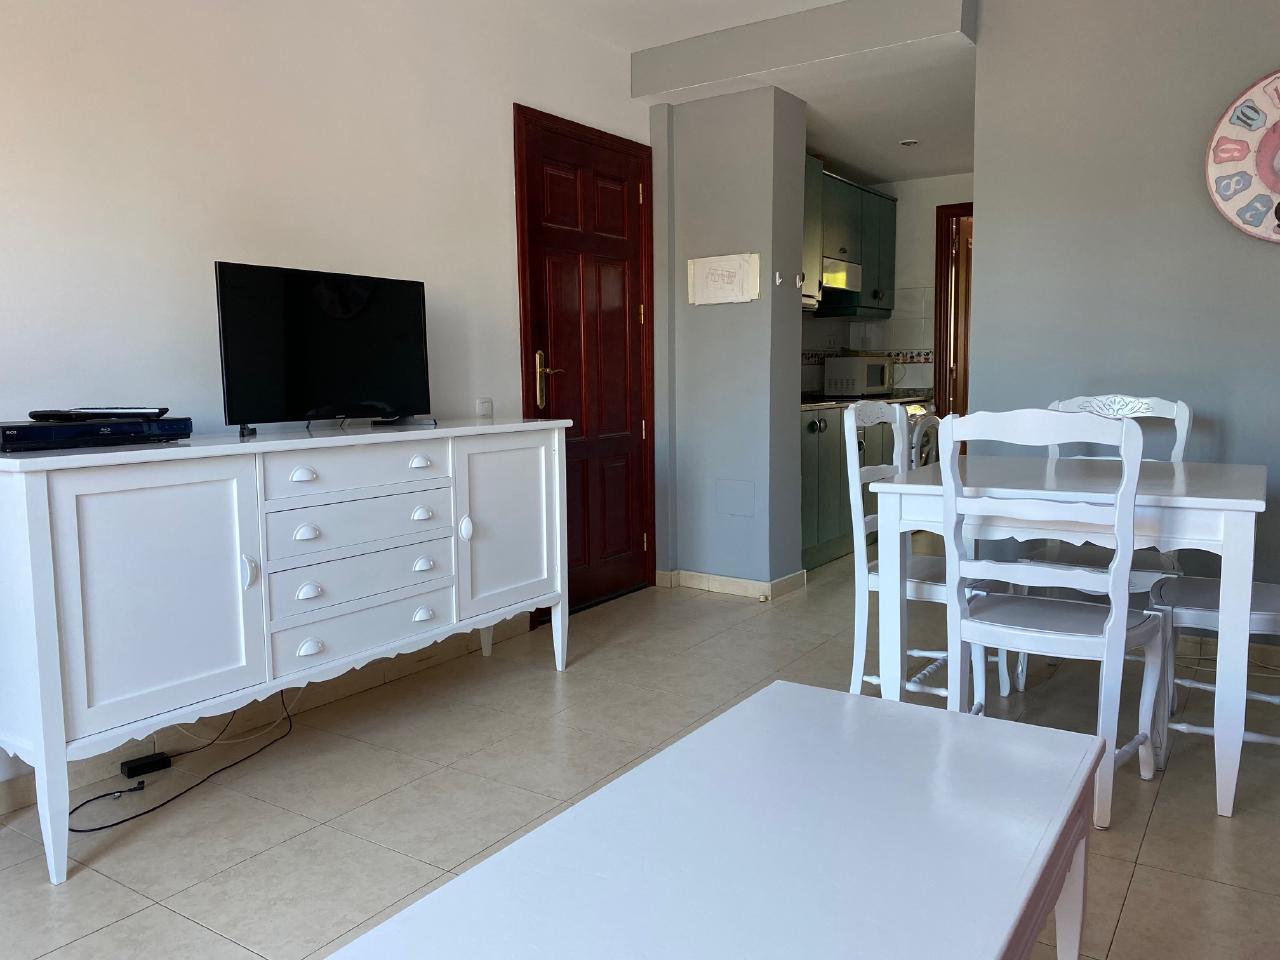 Ferienwohnung Apartments RO Corralejo (II) (431498), Corralejo, Fuerteventura, Kanarische Inseln, Spanien, Bild 26